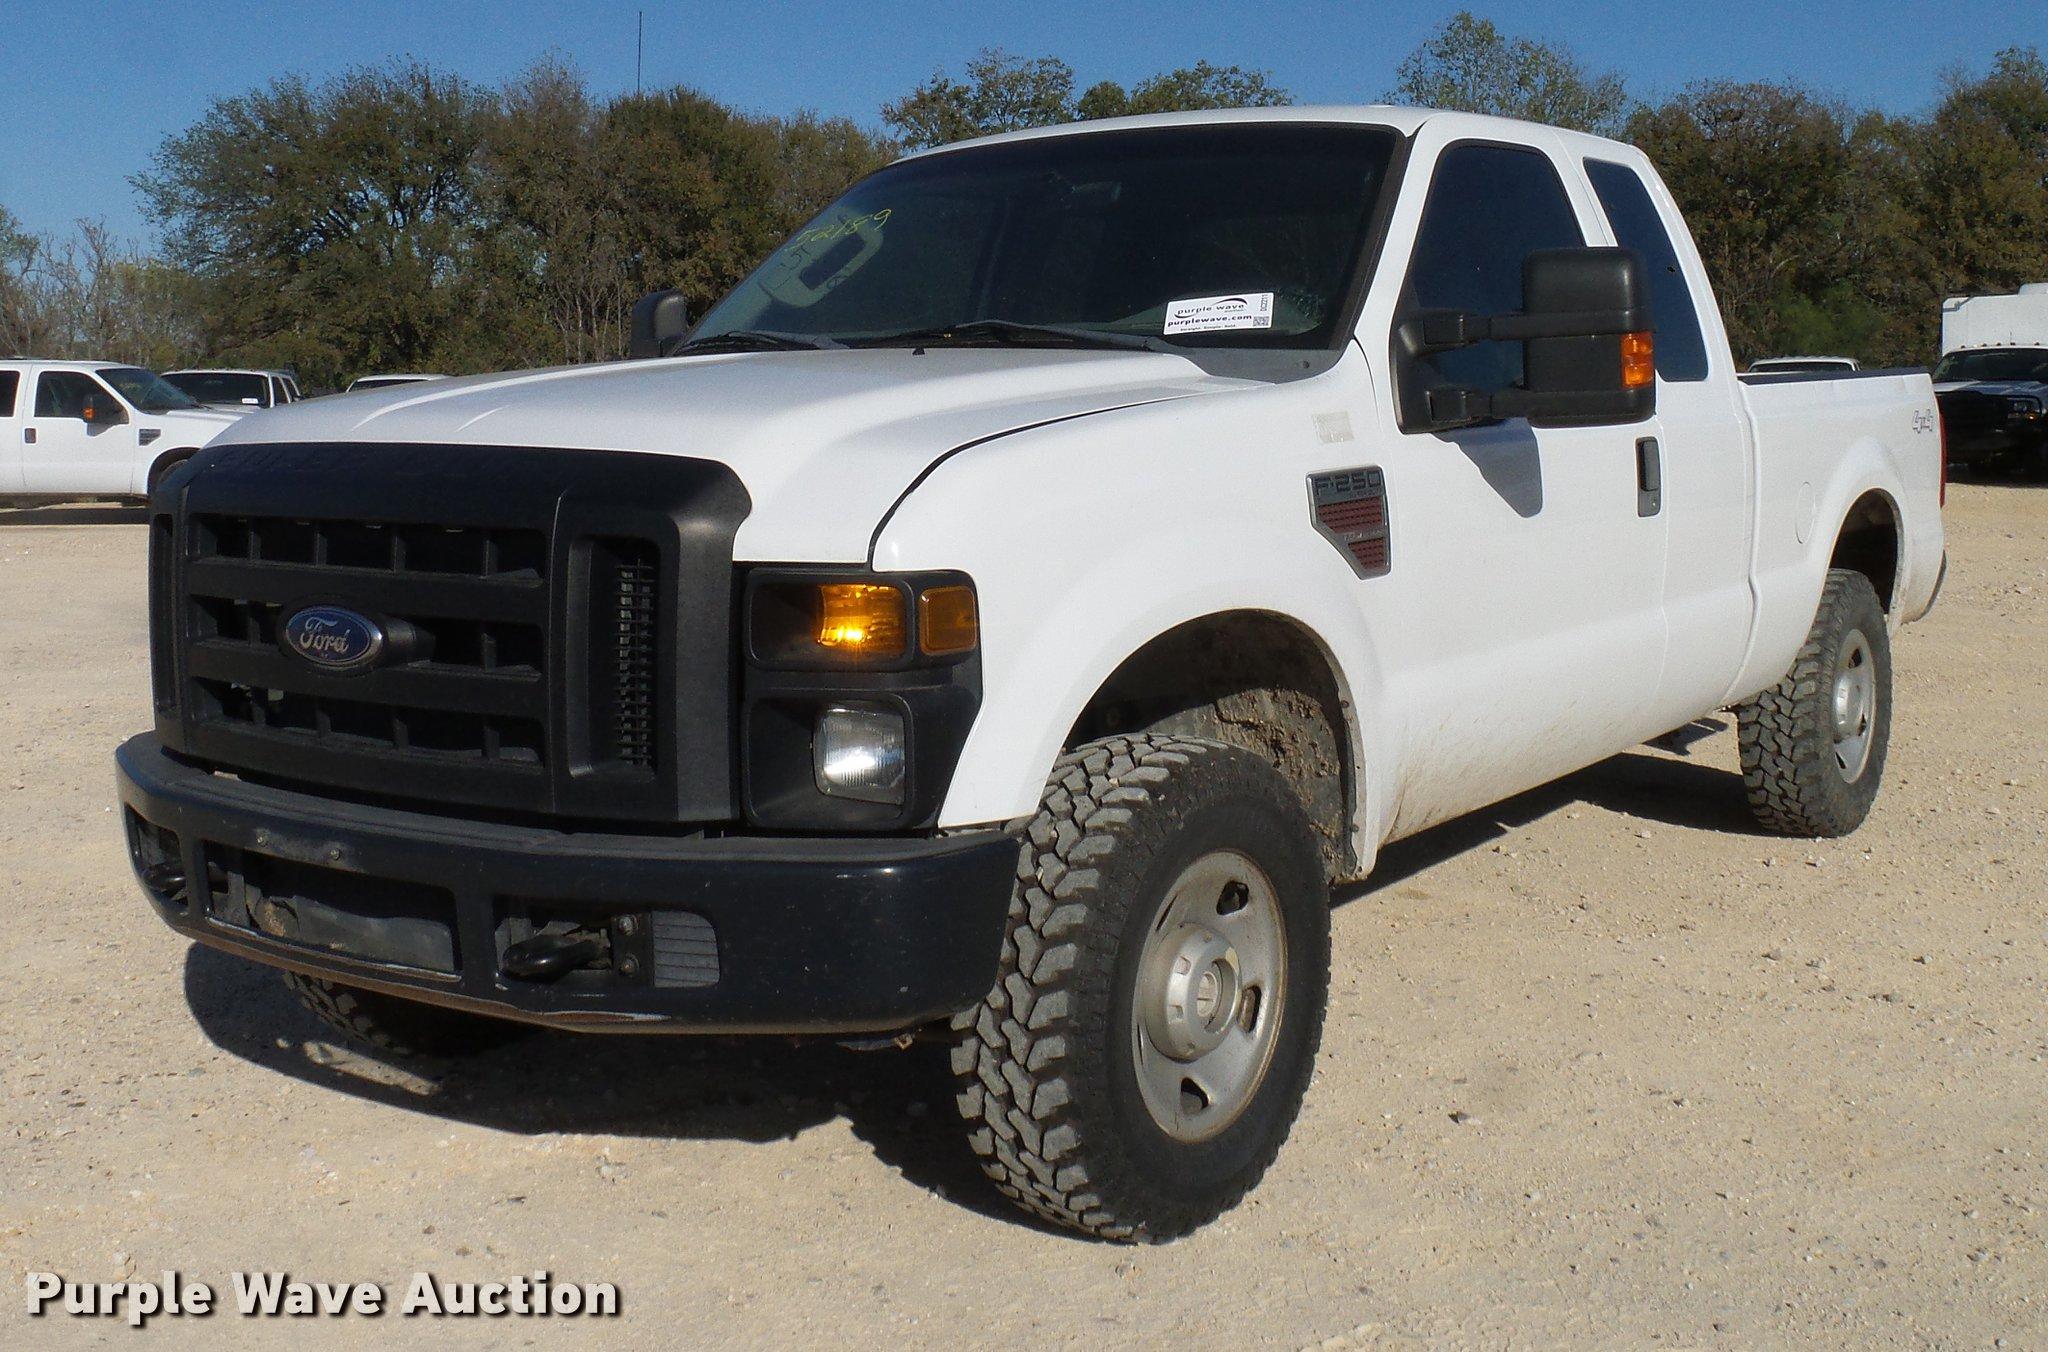 used sale norcal sacramento ford diesel trucks uploads motor auburn e image ar imgurl for company